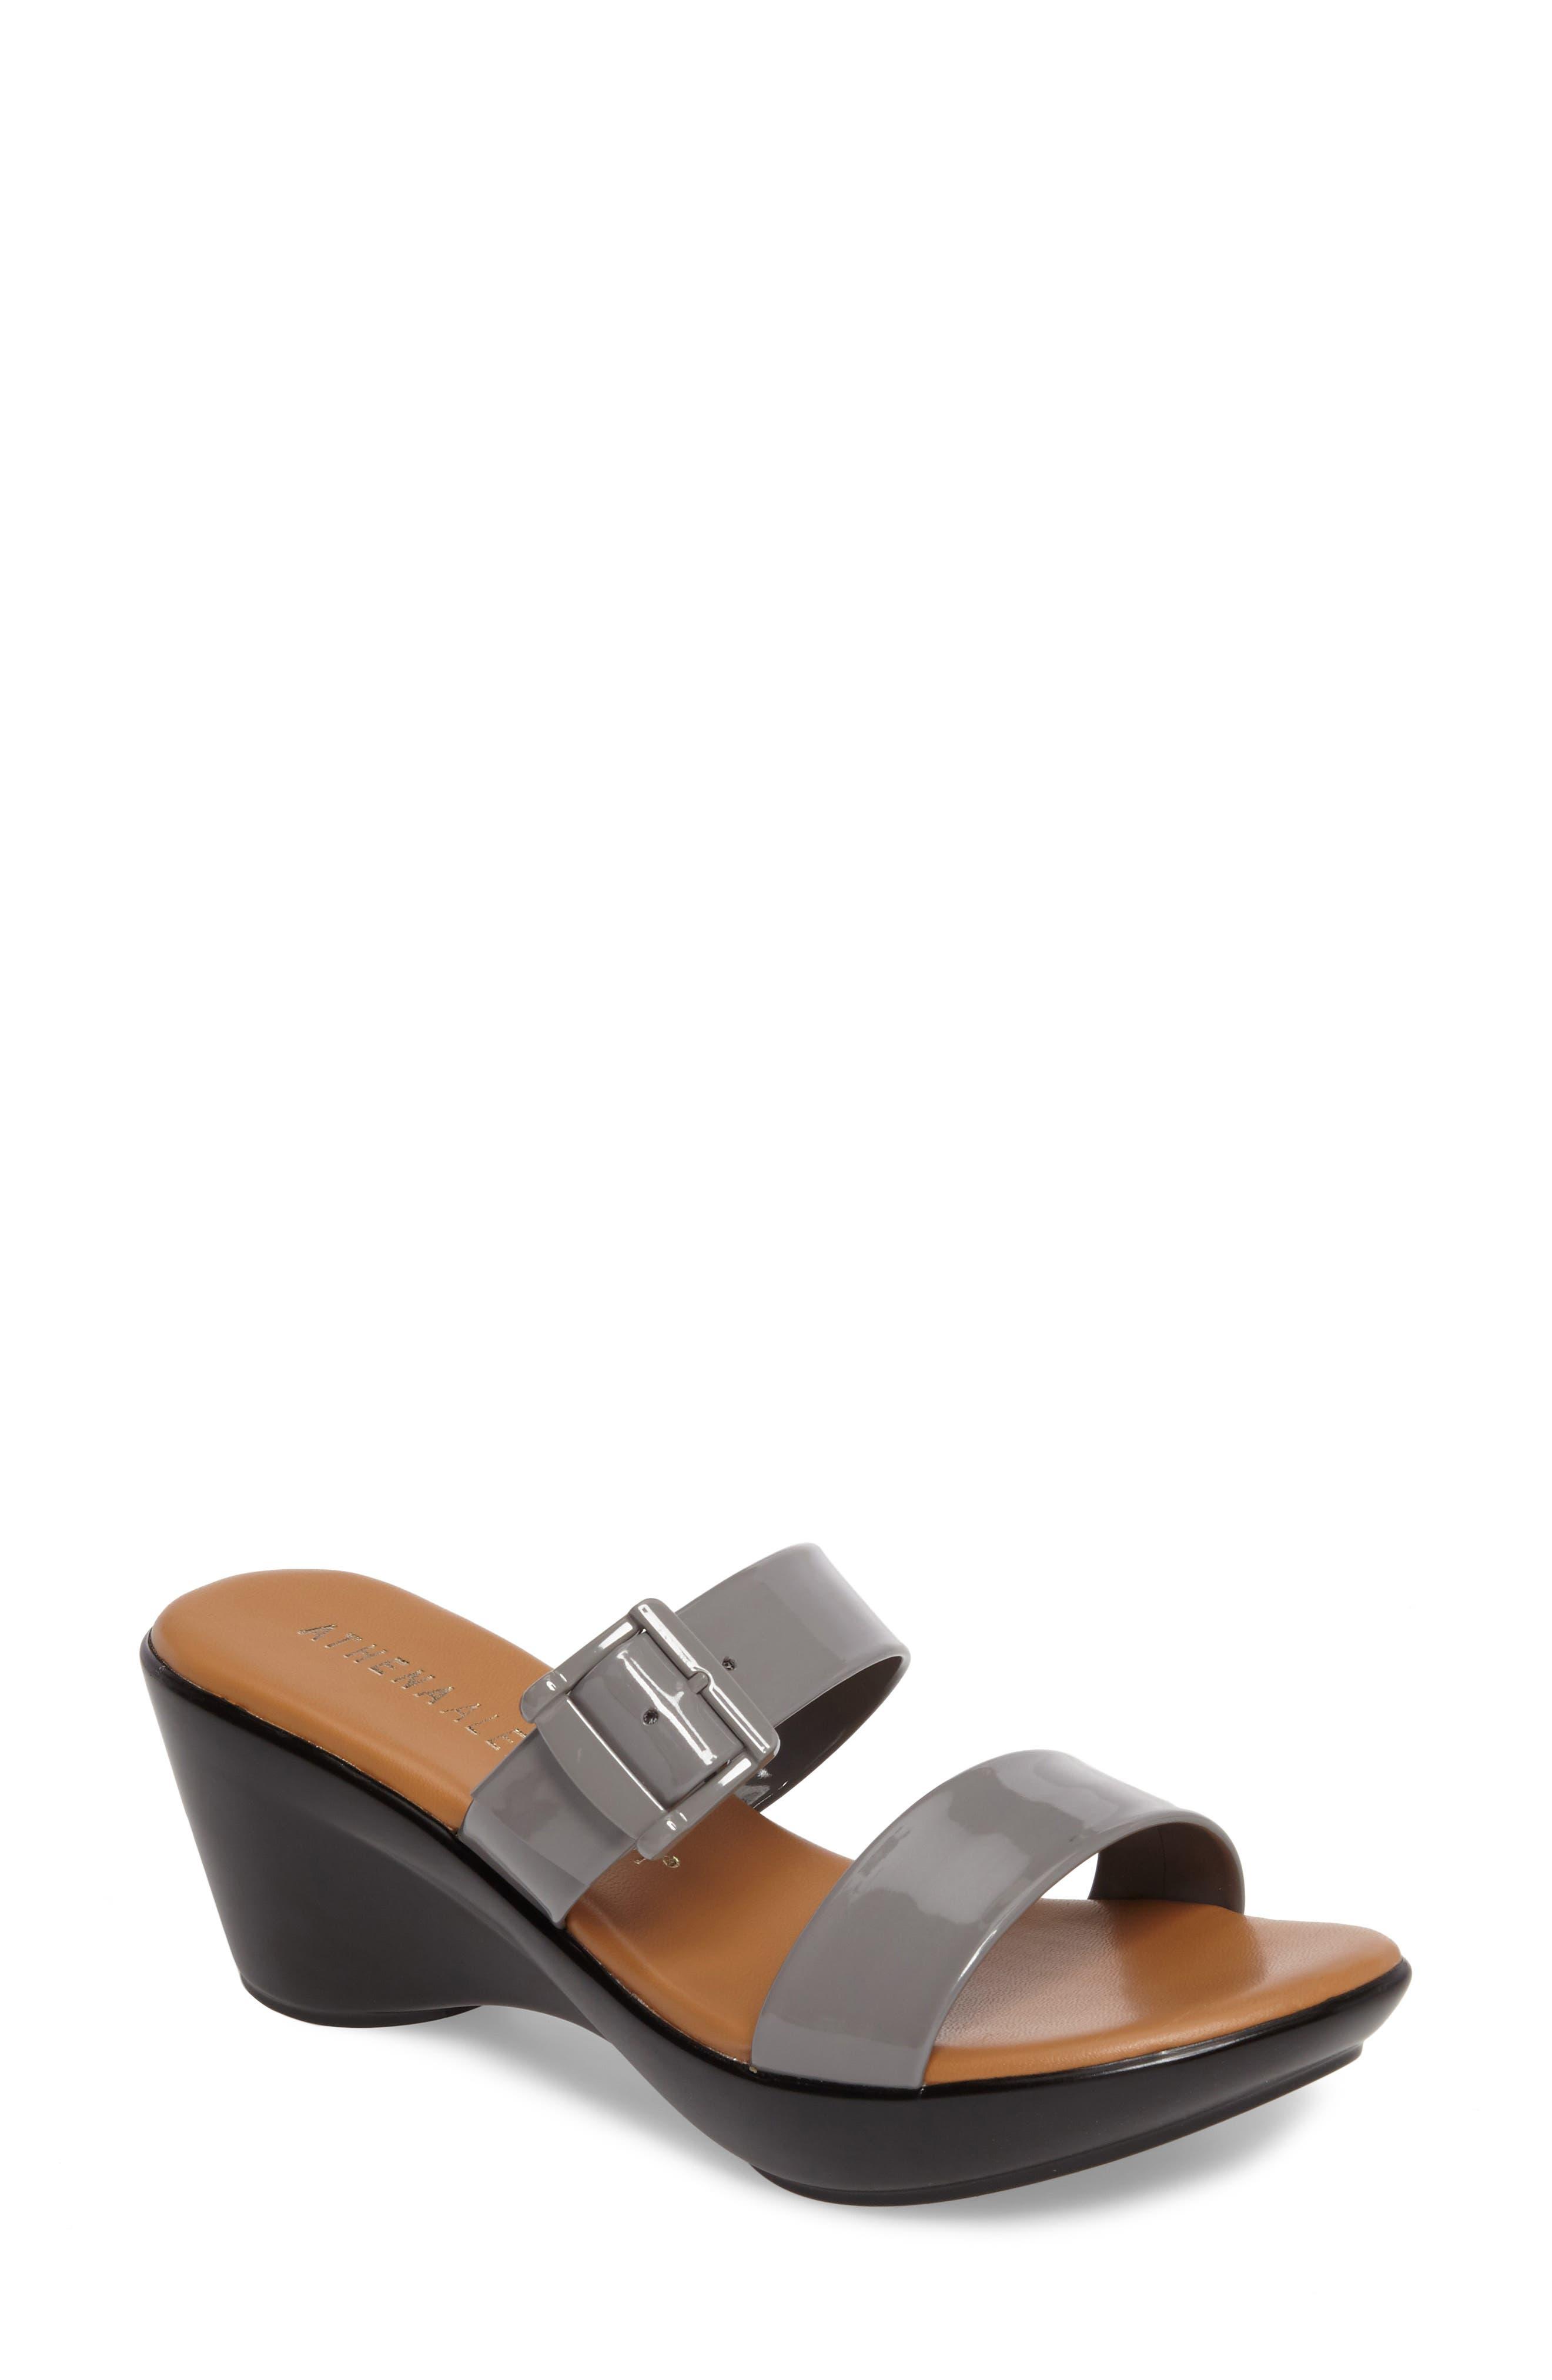 Alternate Image 1 Selected - Athena Alexander Darlling Wedge Sandal (Women)